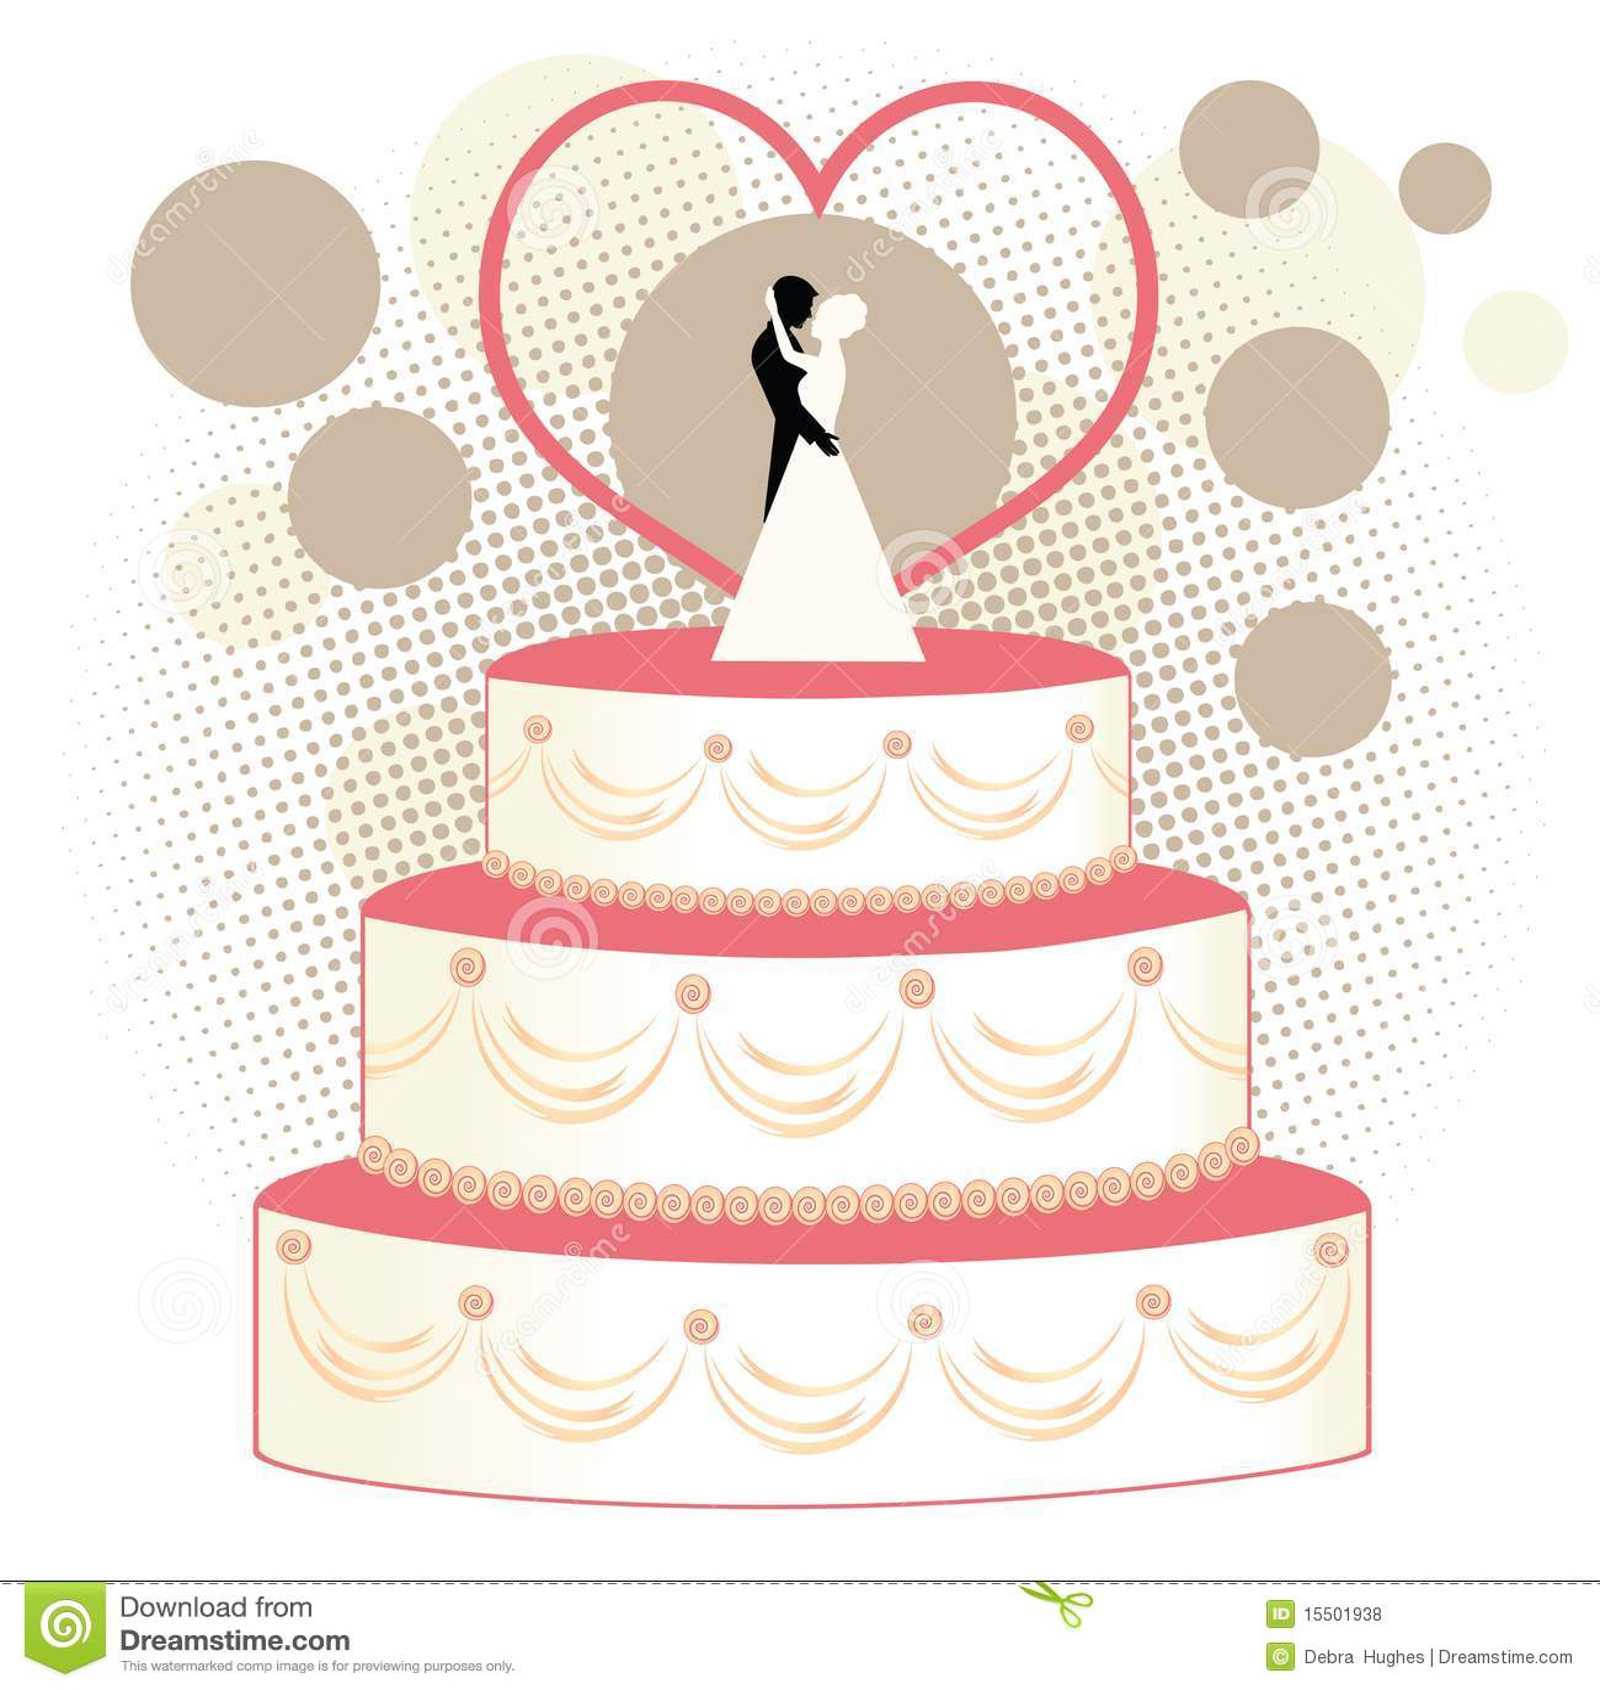 Wedding Cake Bride And Groom Royalty Free Stock s